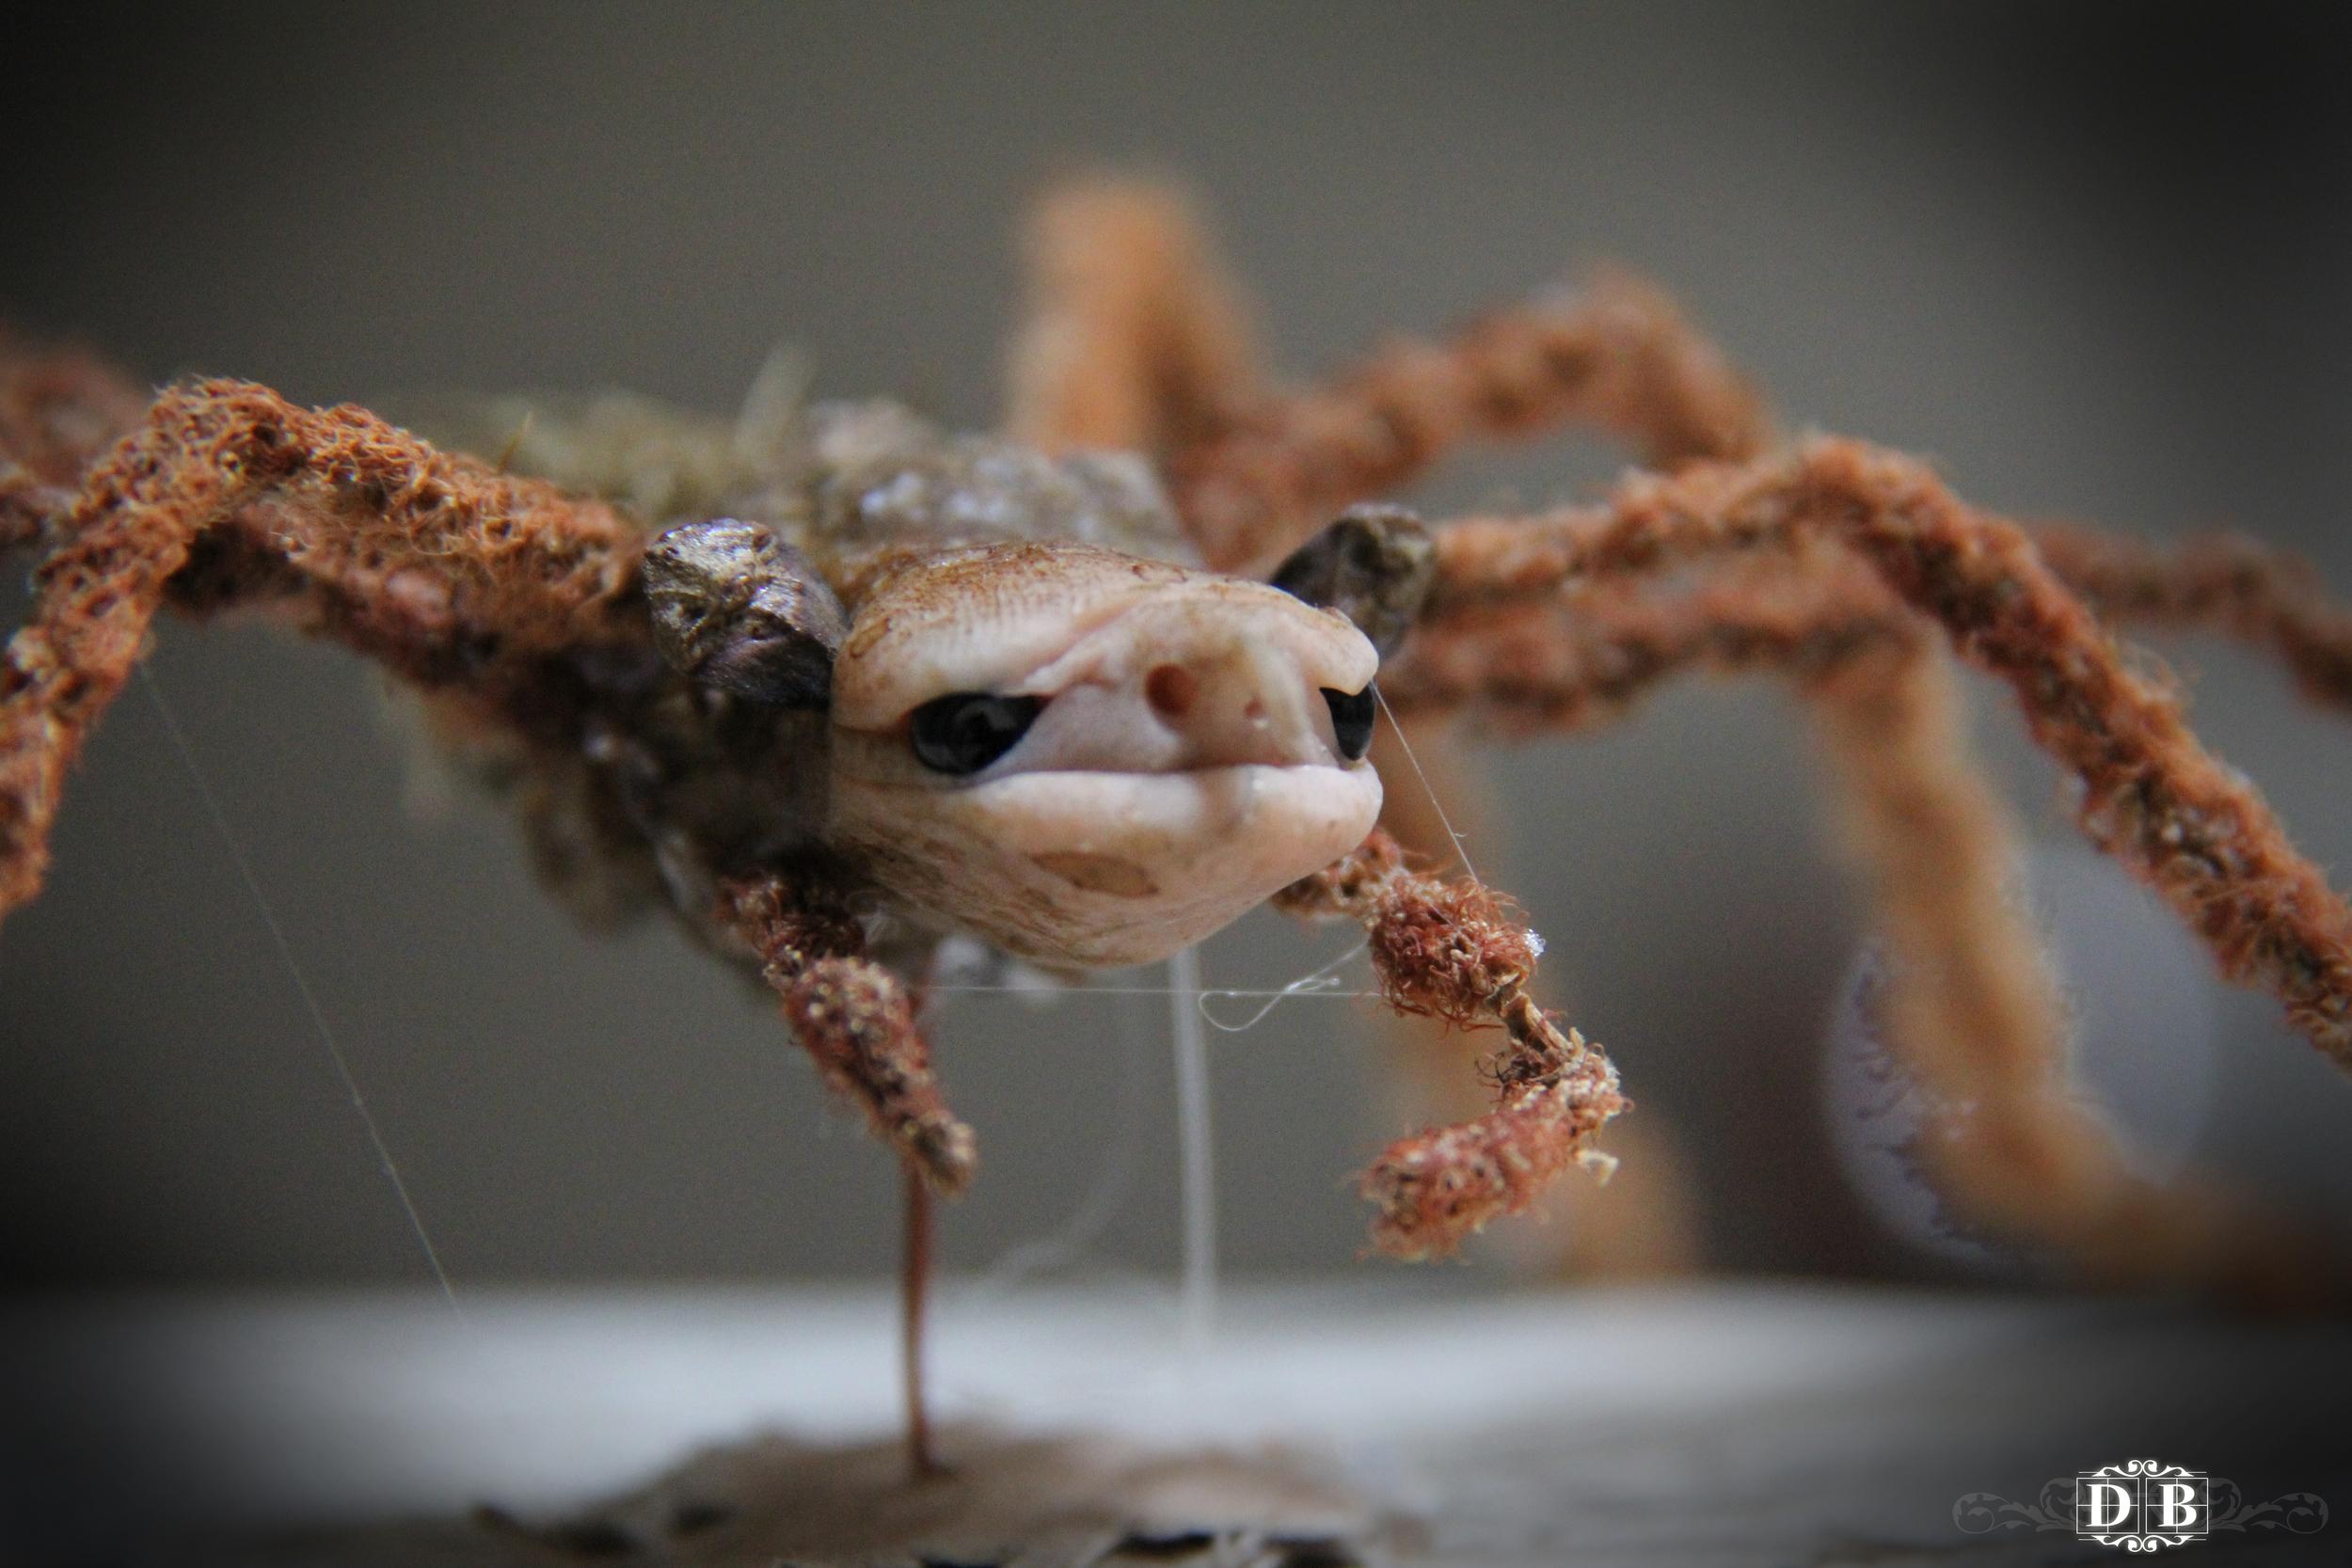 Spiderling_1.jpg